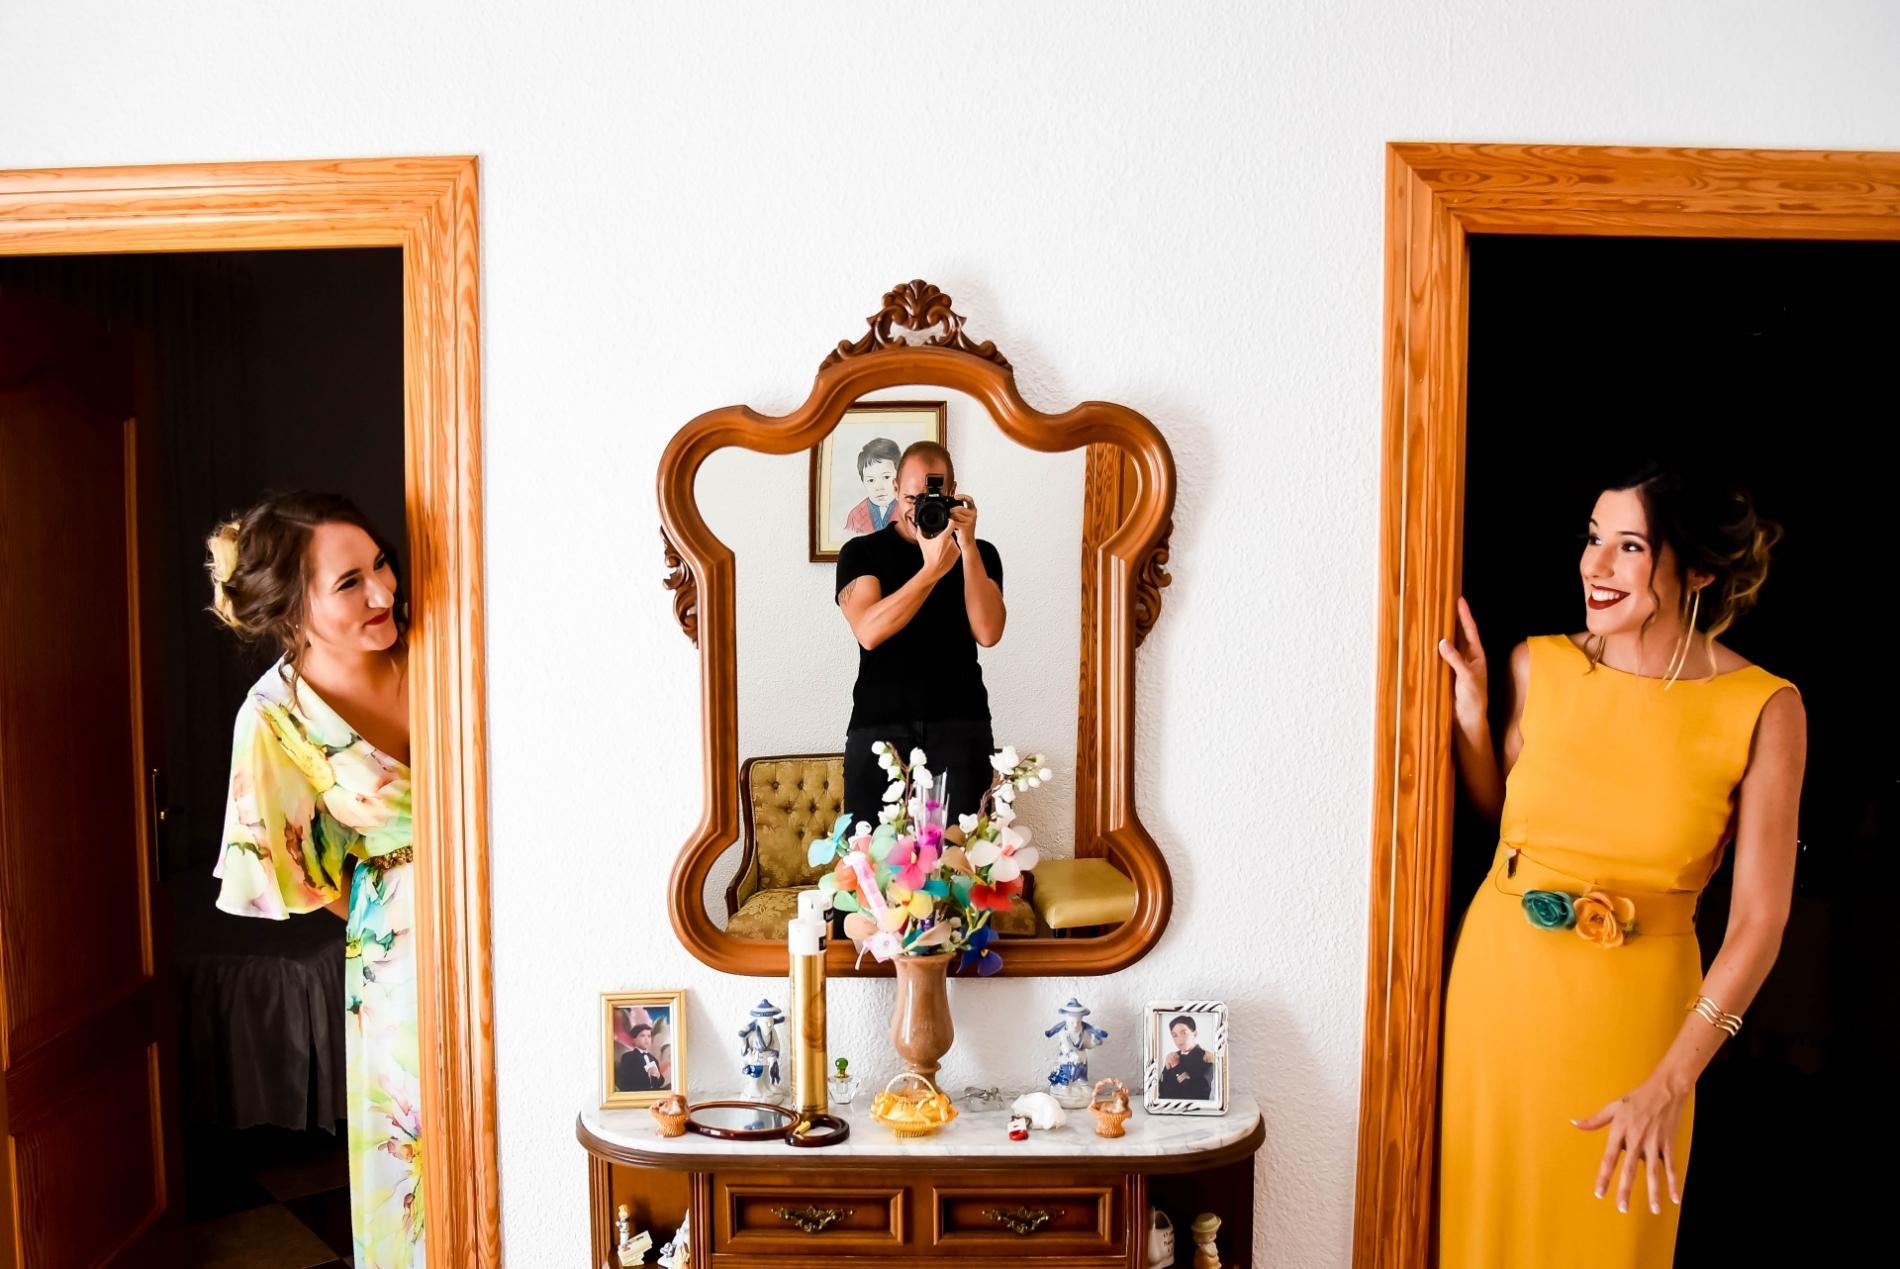 Murcia wedding photographer in action | Eduardo Blanco photography